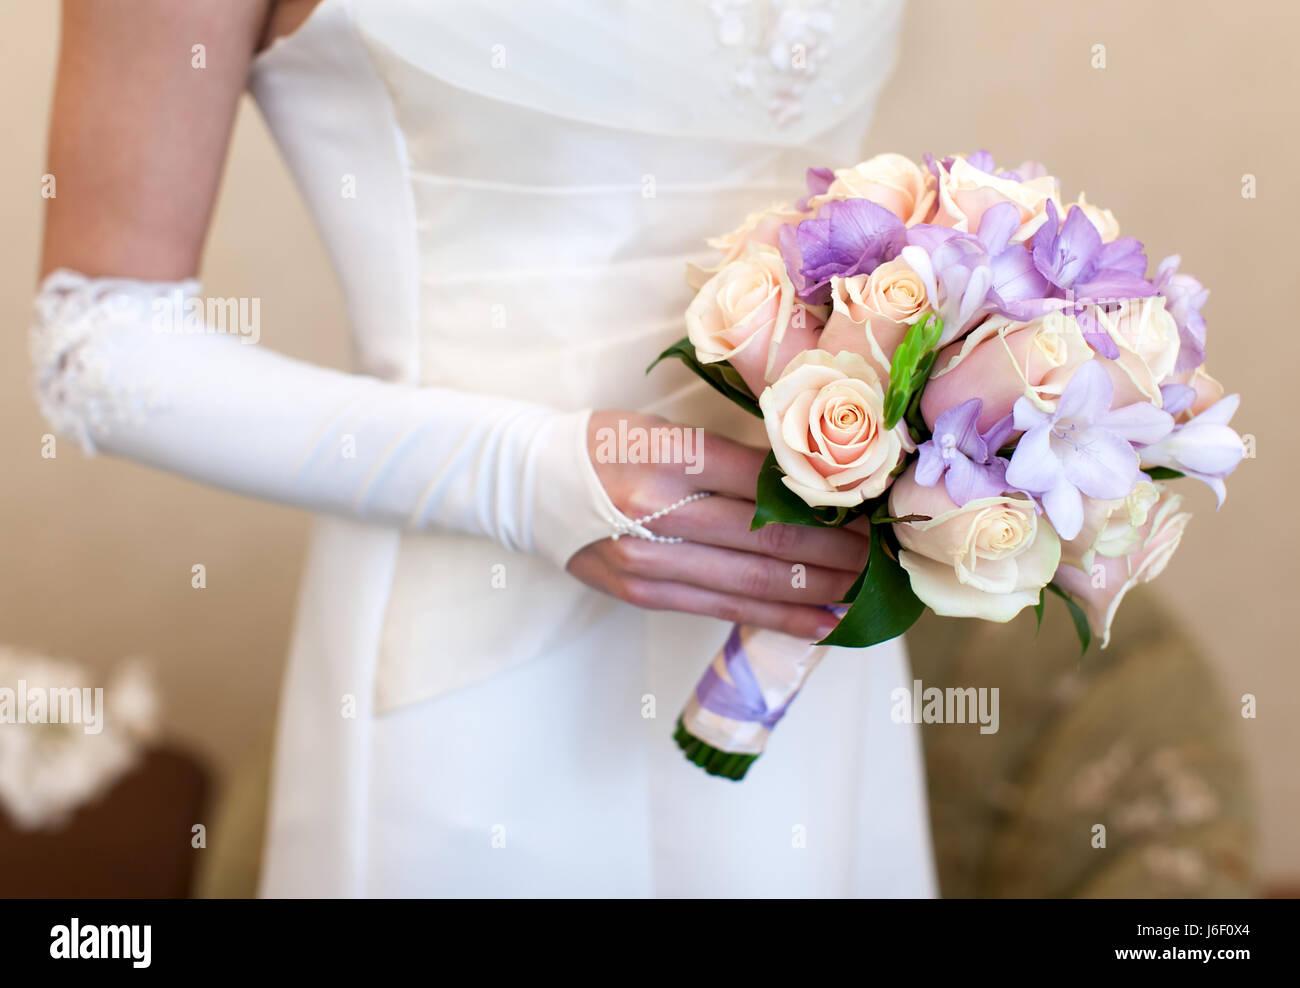 Bouquet Sposa Iris.Irises And Roses Stock Photos Irises And Roses Stock Images Alamy